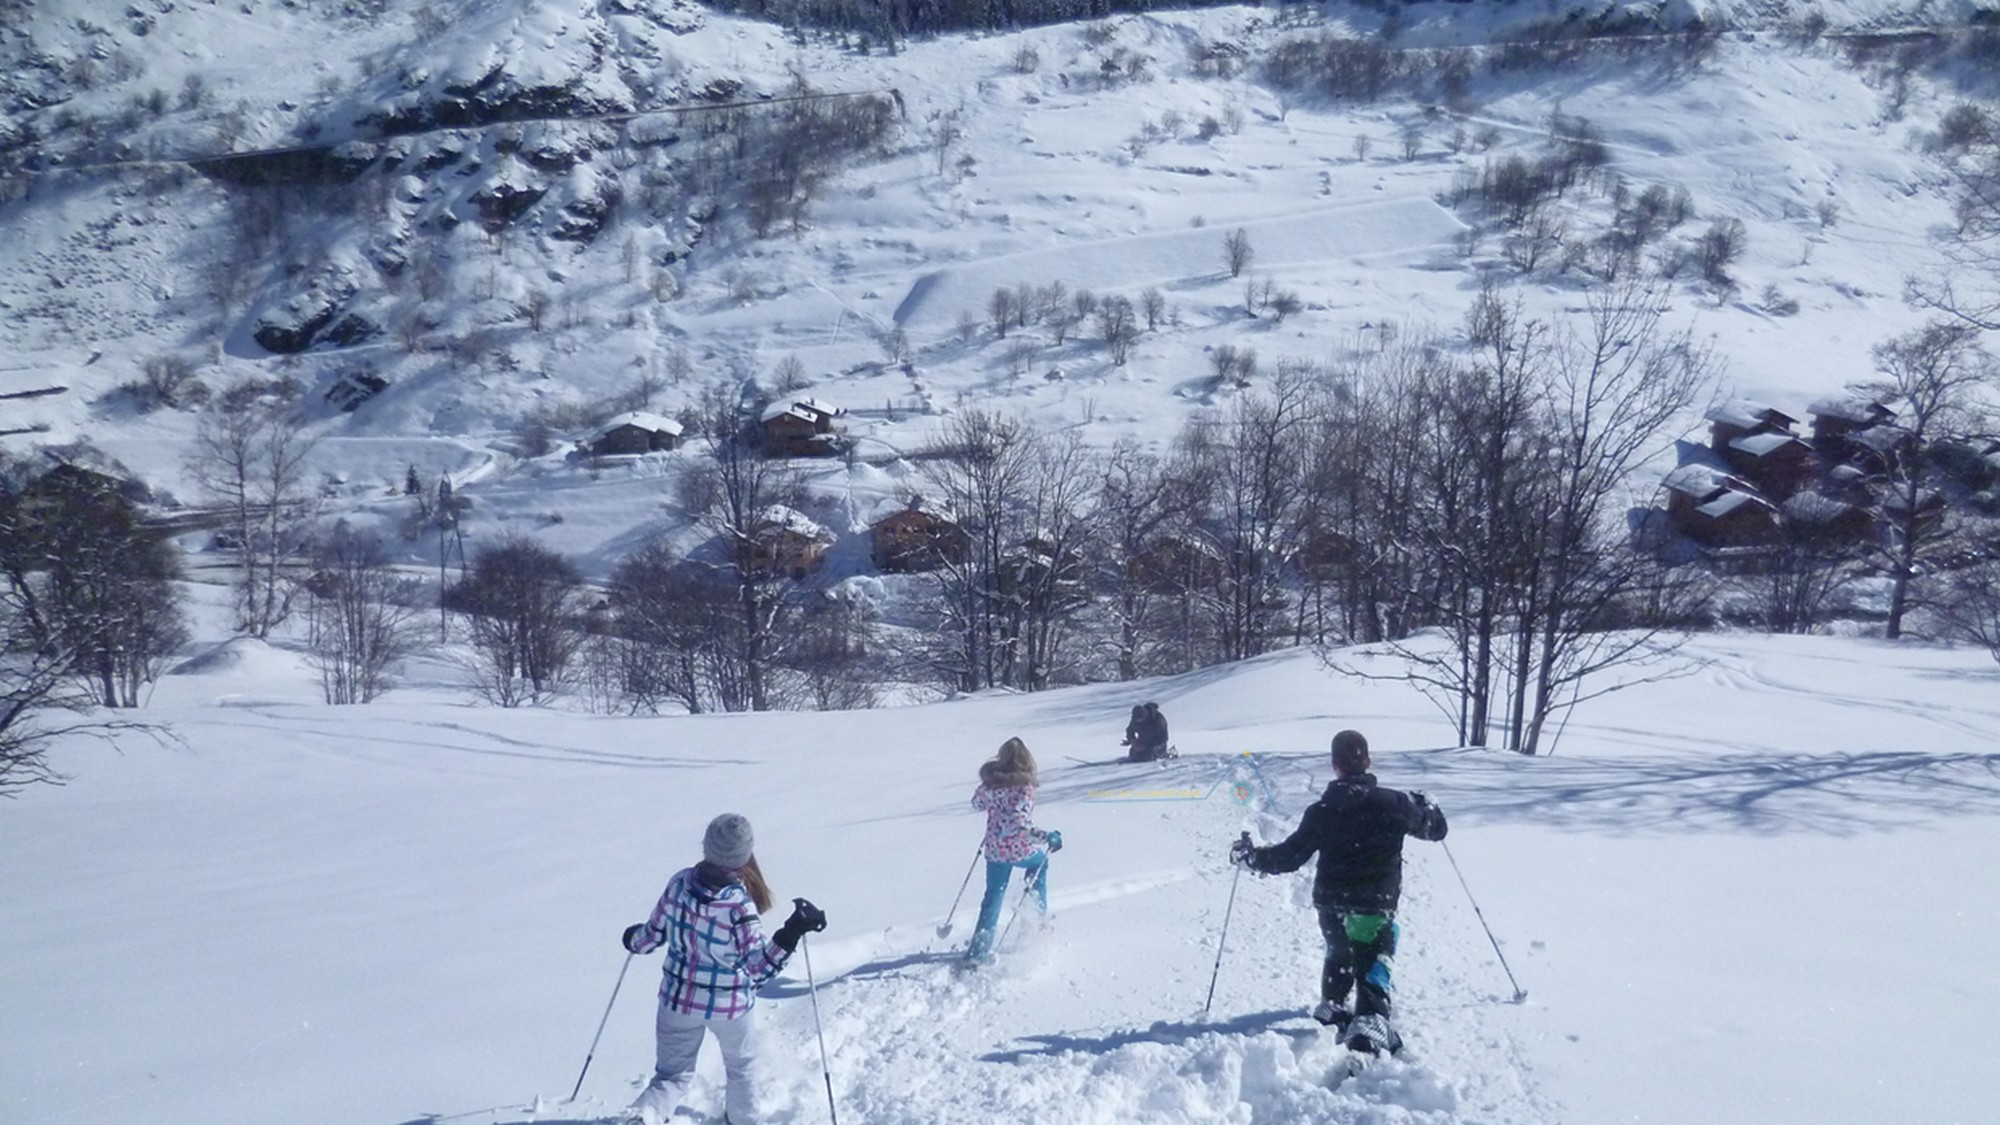 Balade & Randonnée en raquettes dans les Alpes